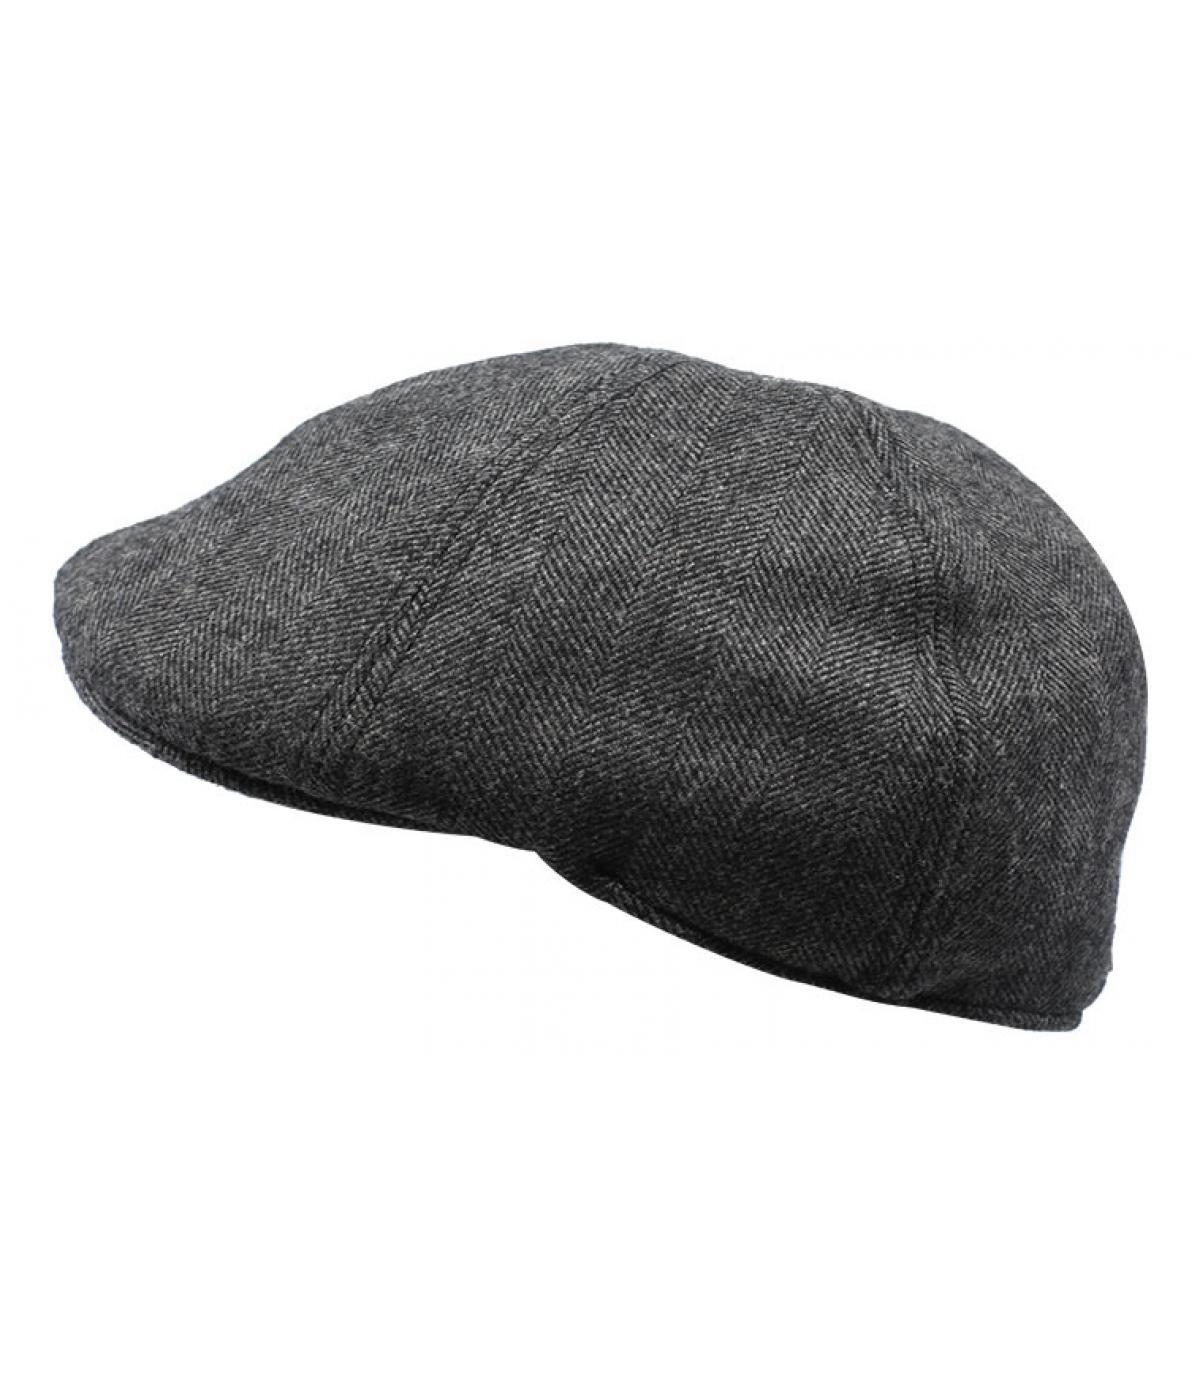 Duckbill Cap grau Wolle